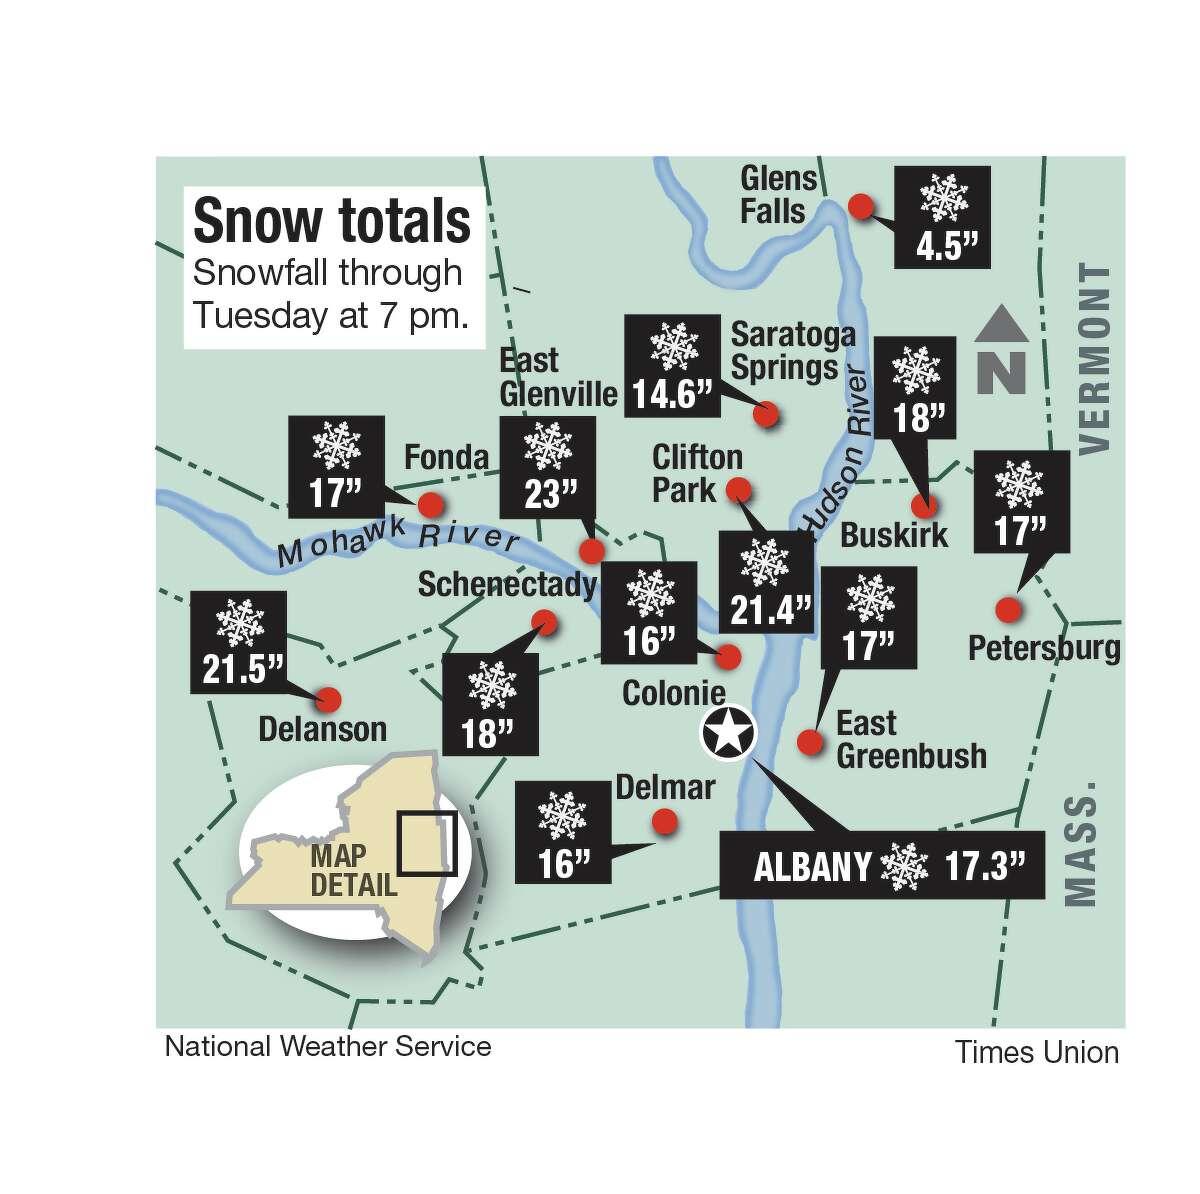 Snowfall totals for the Capital Region on Dec. 2, 2019. (Joyce Bassett / Times Union)